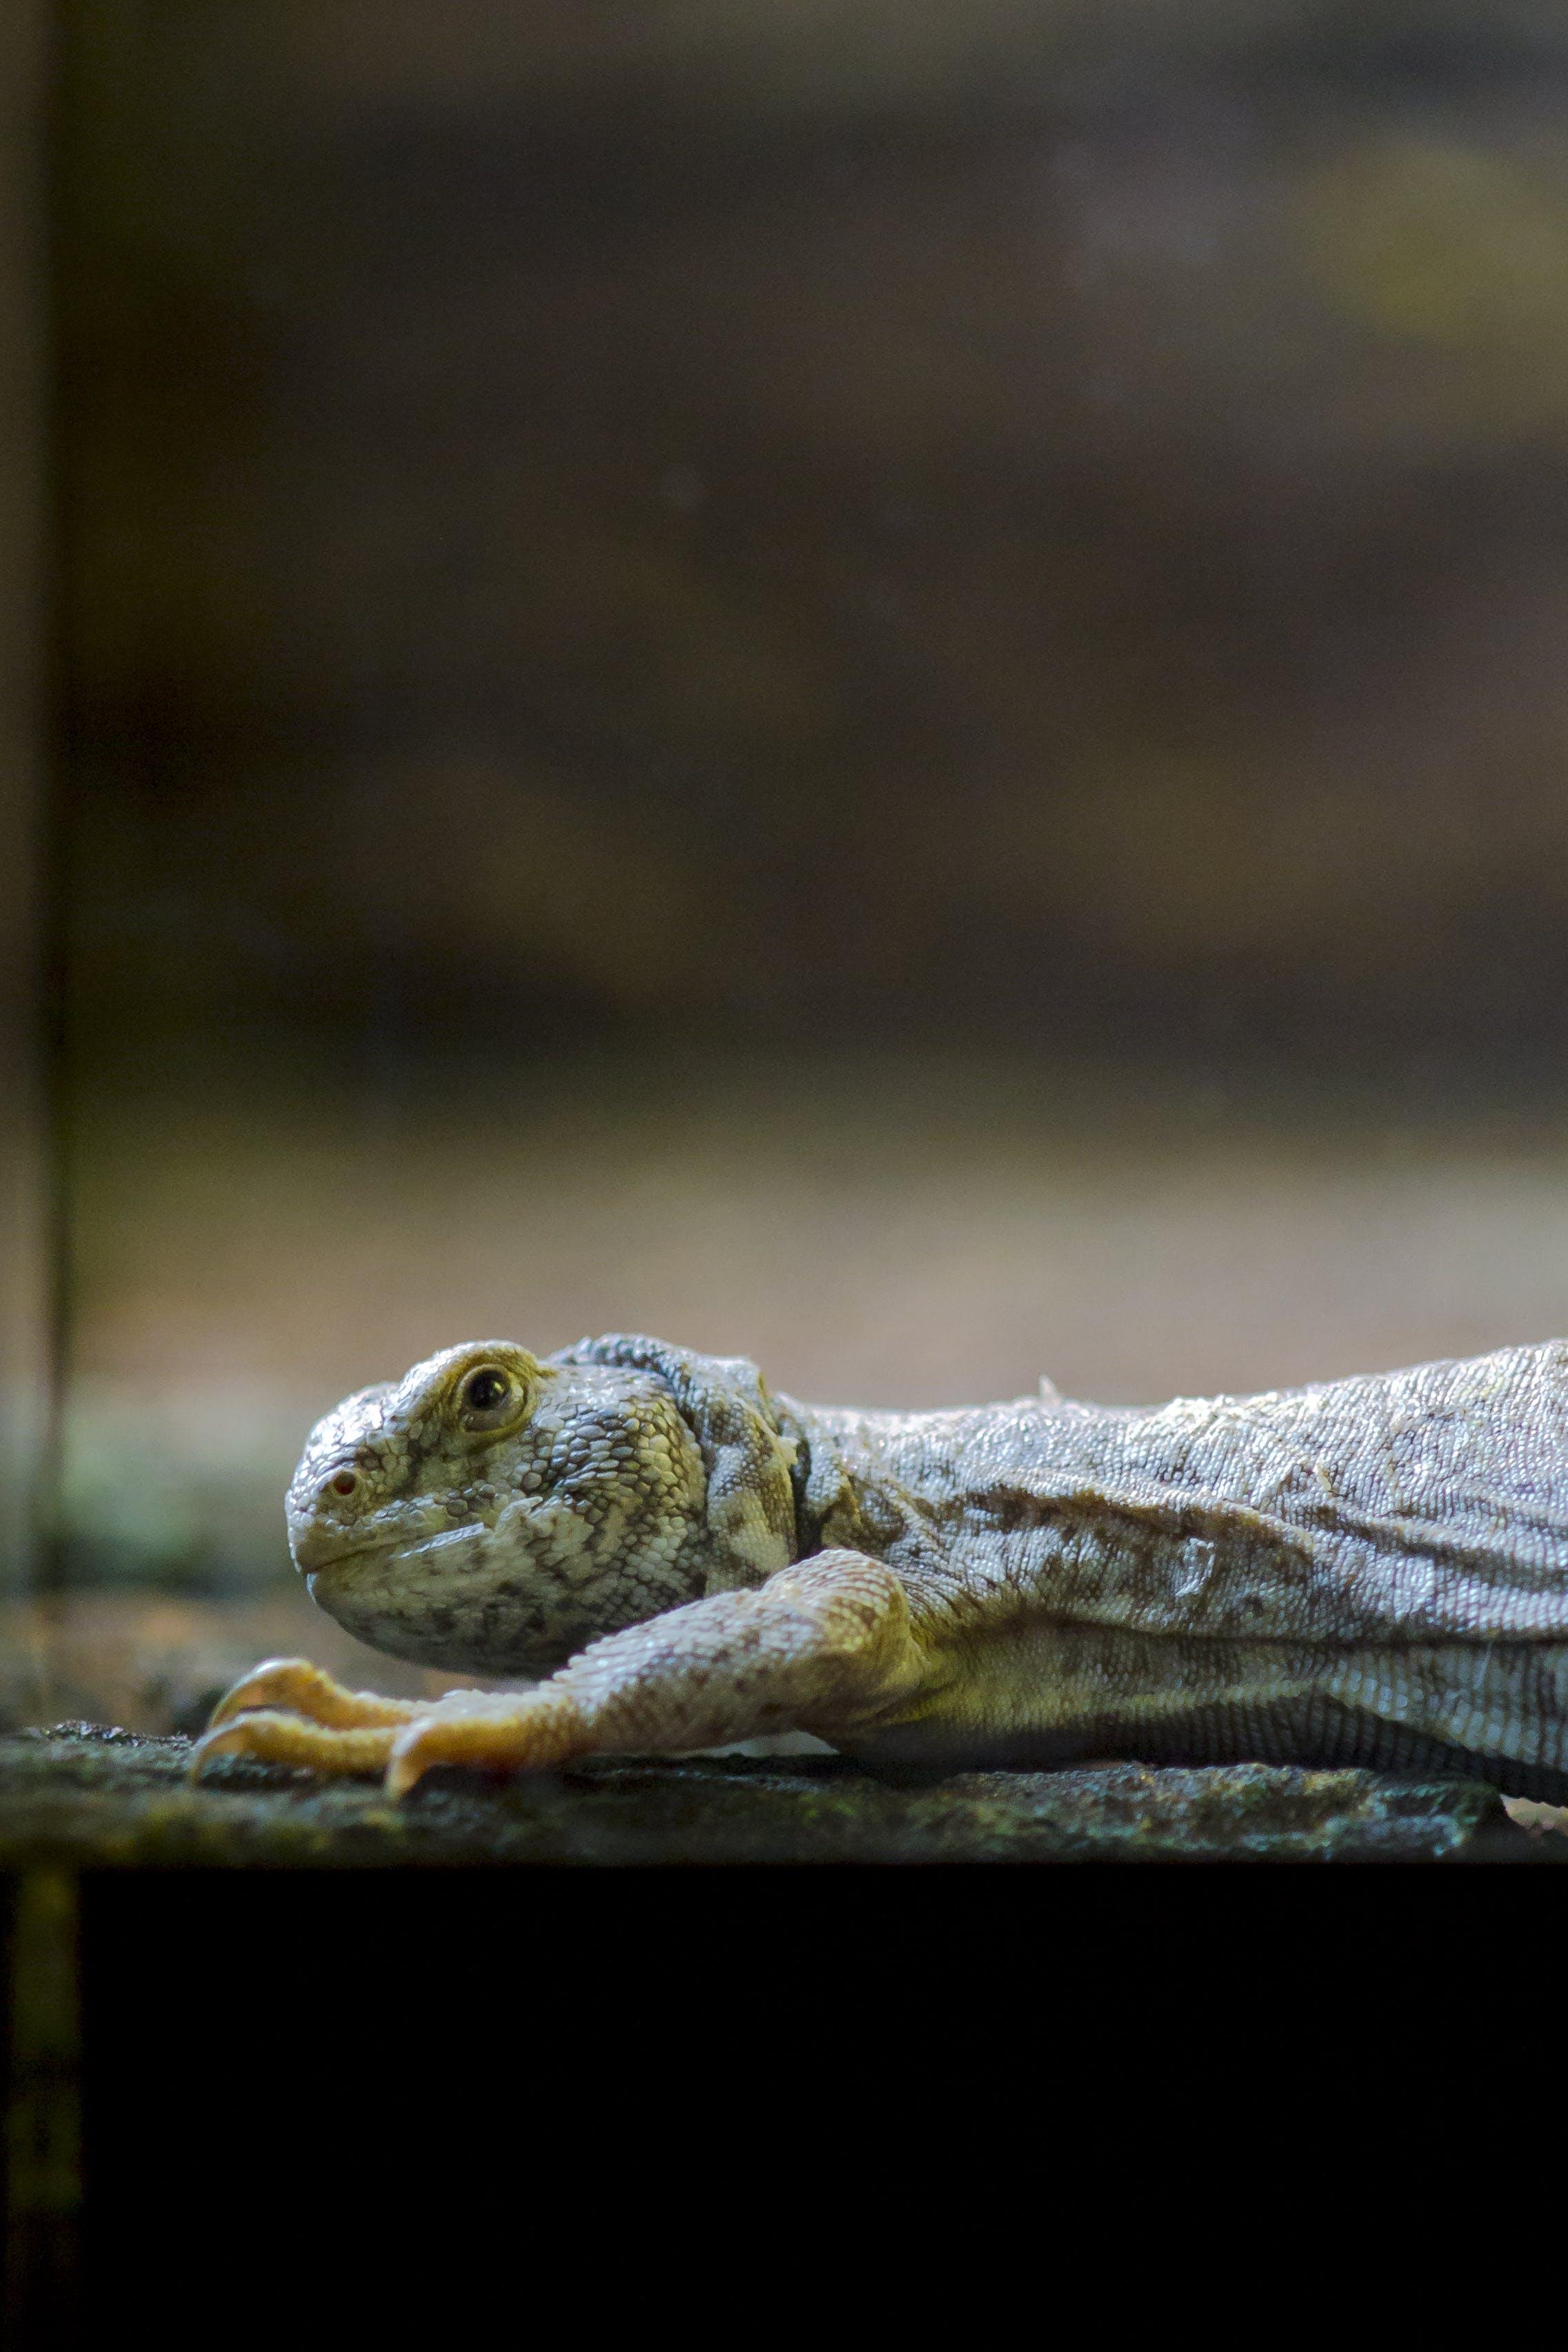 Close-up Photo Of Lizard